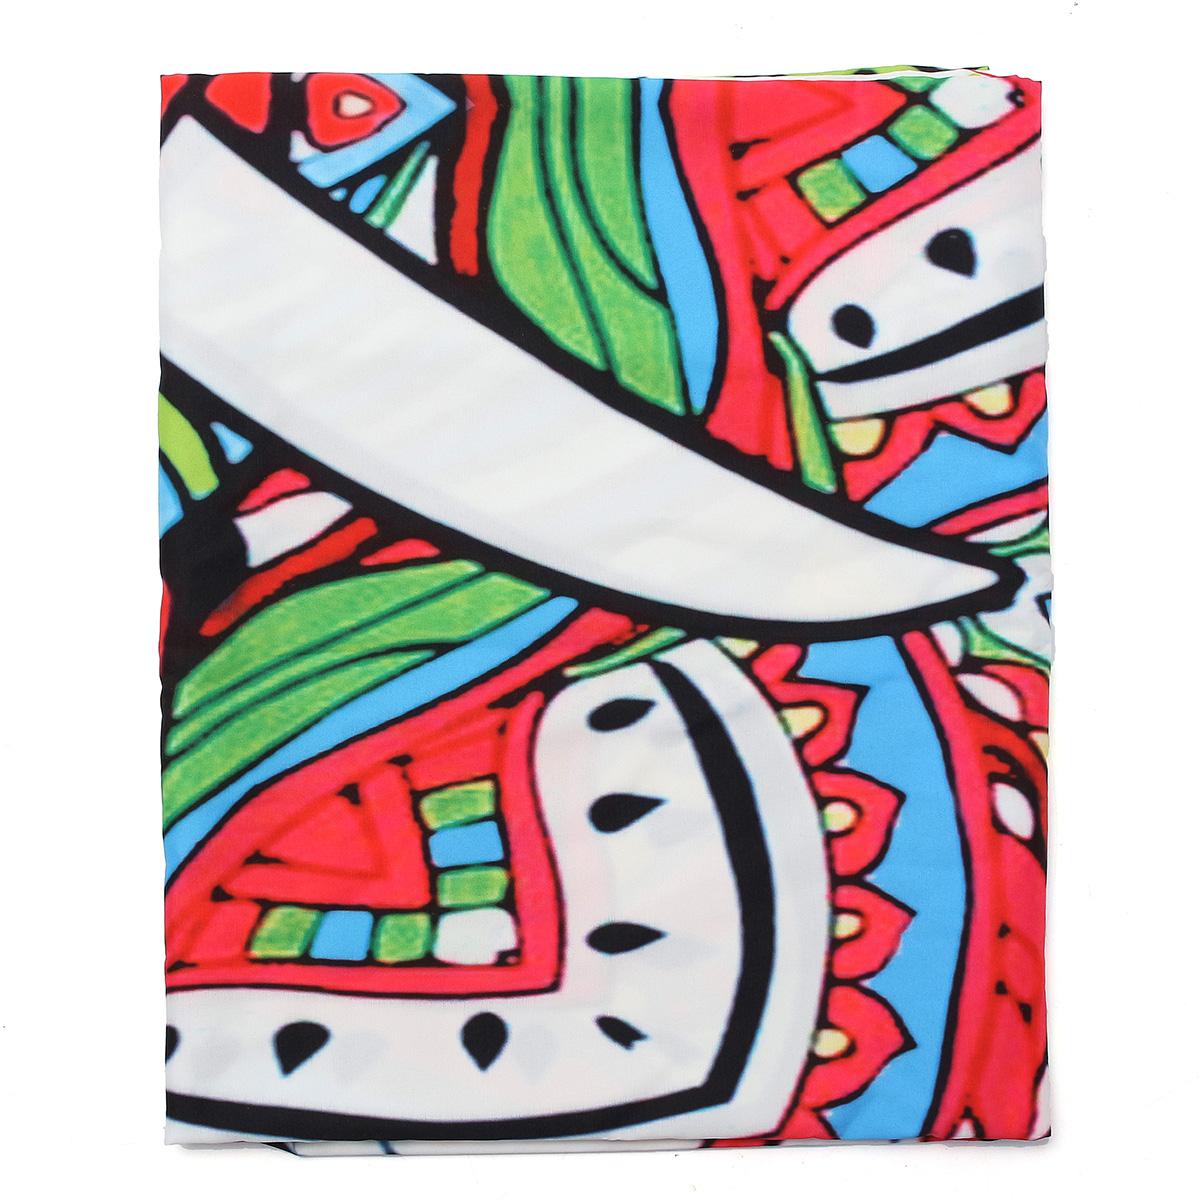 Beach Blanket Yoga Mat Elephant Bohemian Style Tapestry Hanging Curtain Throw Towel Bedspread